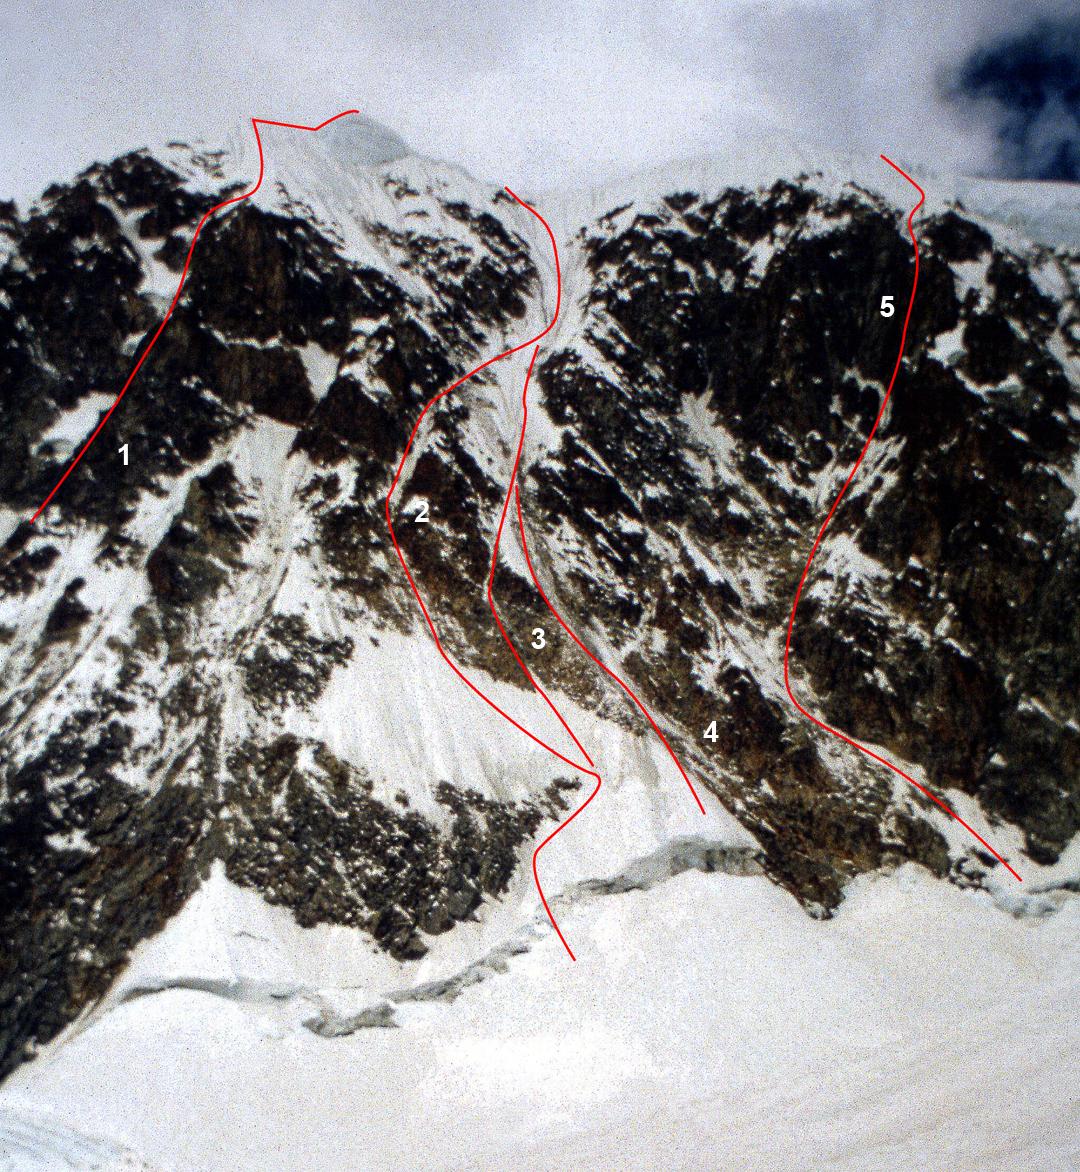 The central section of Illampu's west face, seen in 1997. (1) Nada Mañana (1991). (2) Koroska Smer (1986). (3) Chinnery-Schweizer (1997). (4) Central Couloir Direct Start (1990). (5) Alpos Secret (1991).